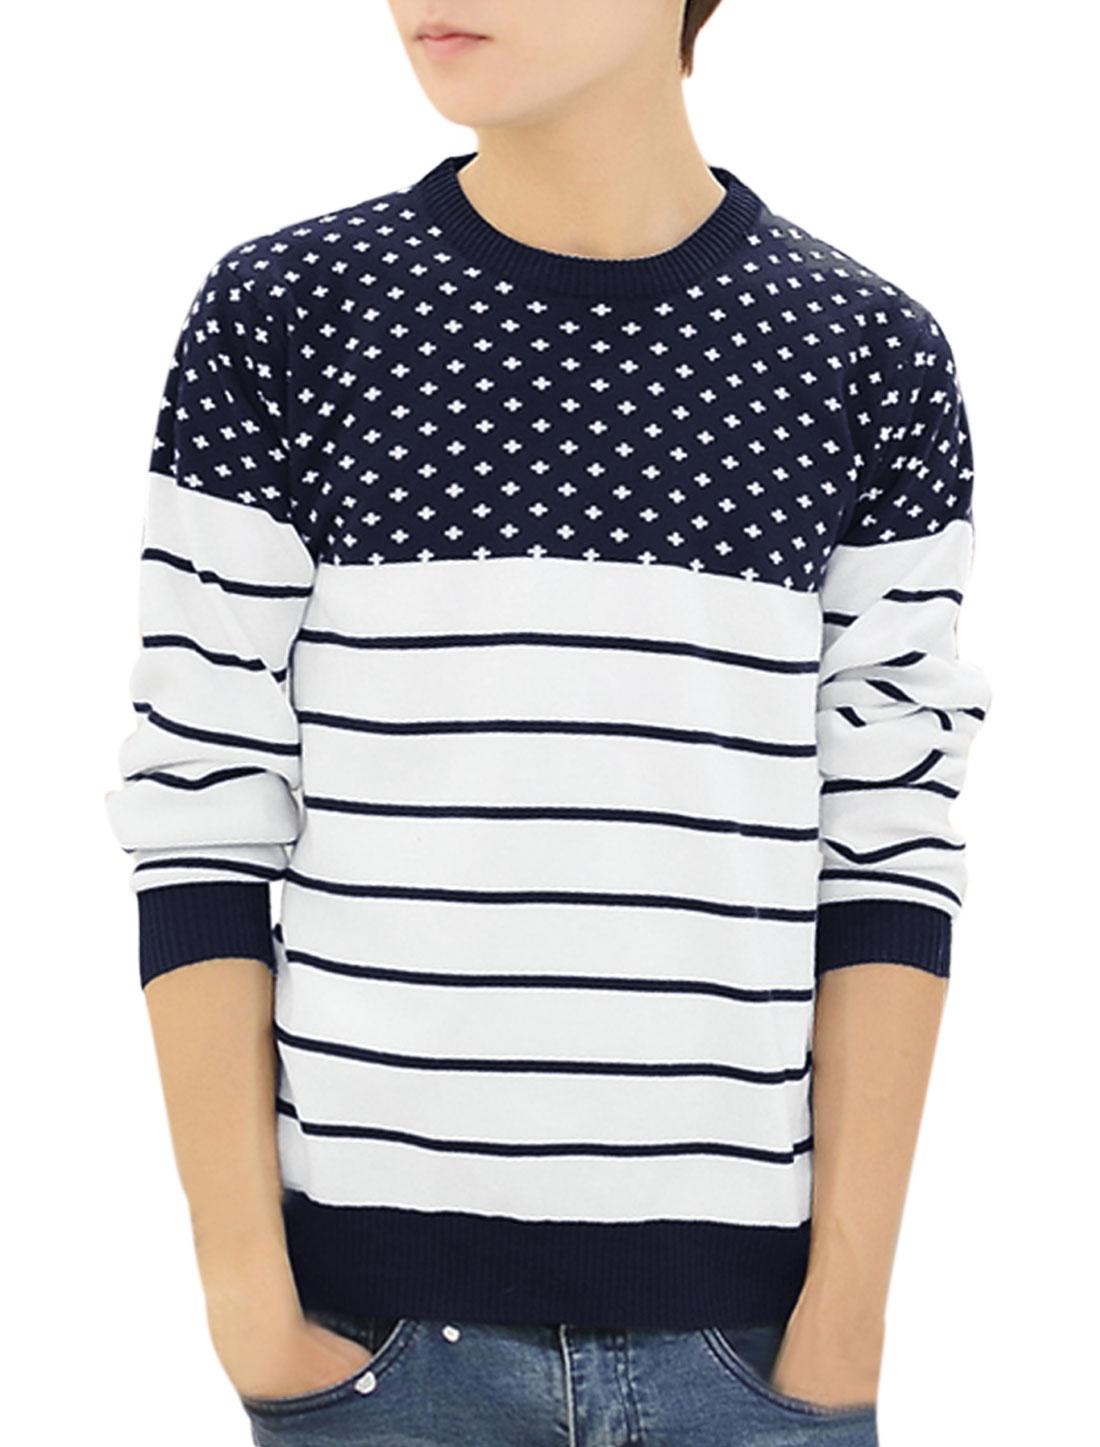 Men Crew Neck Cross Stripes Pattern Pullover Casual Sweater Navy Blue M